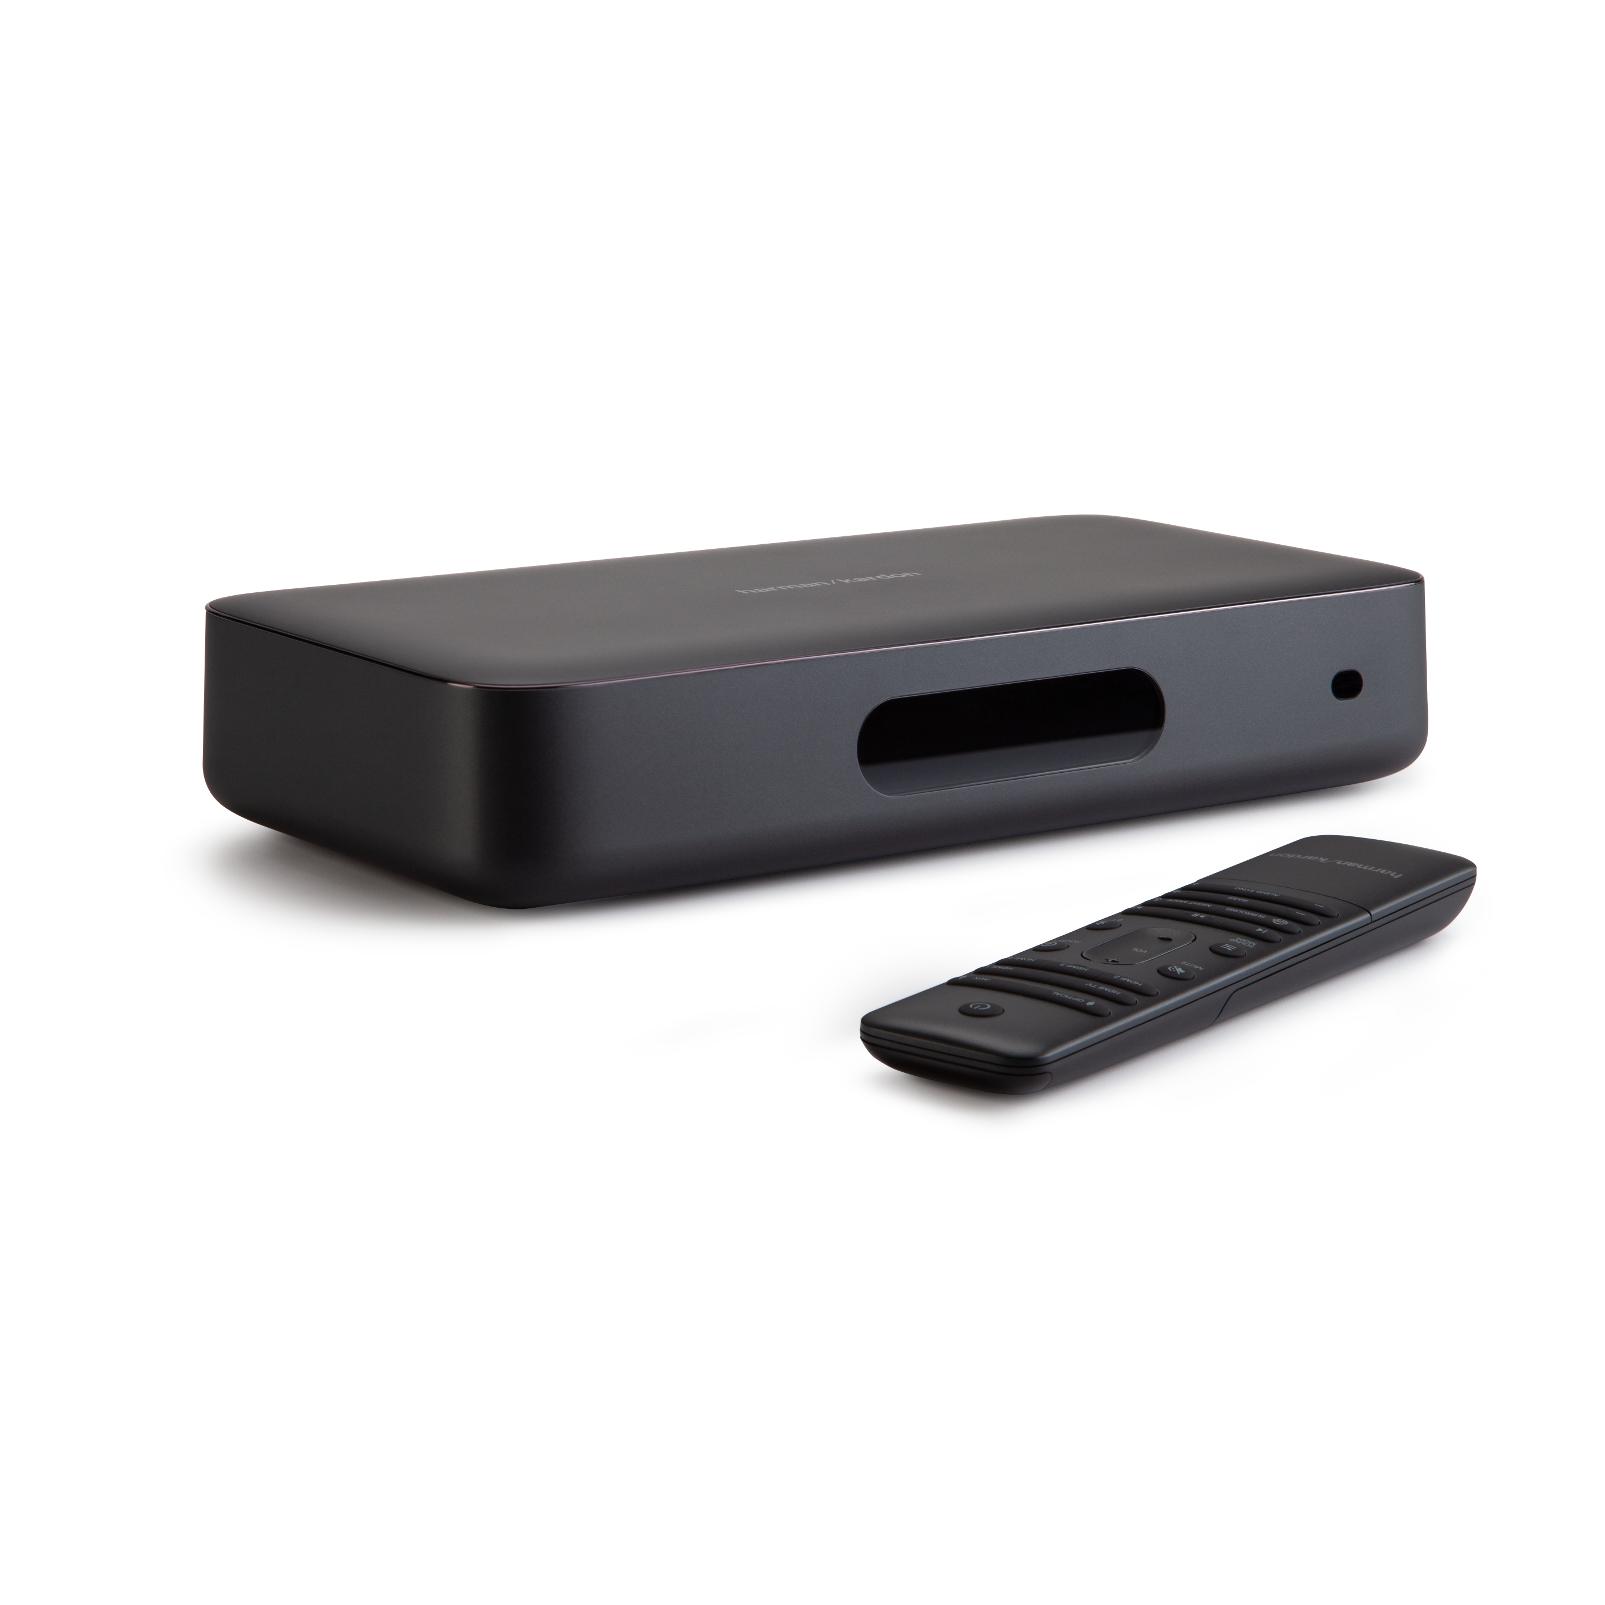 Harman Kardon Surround - Black - Wireless Home Theater System - Detailshot 1